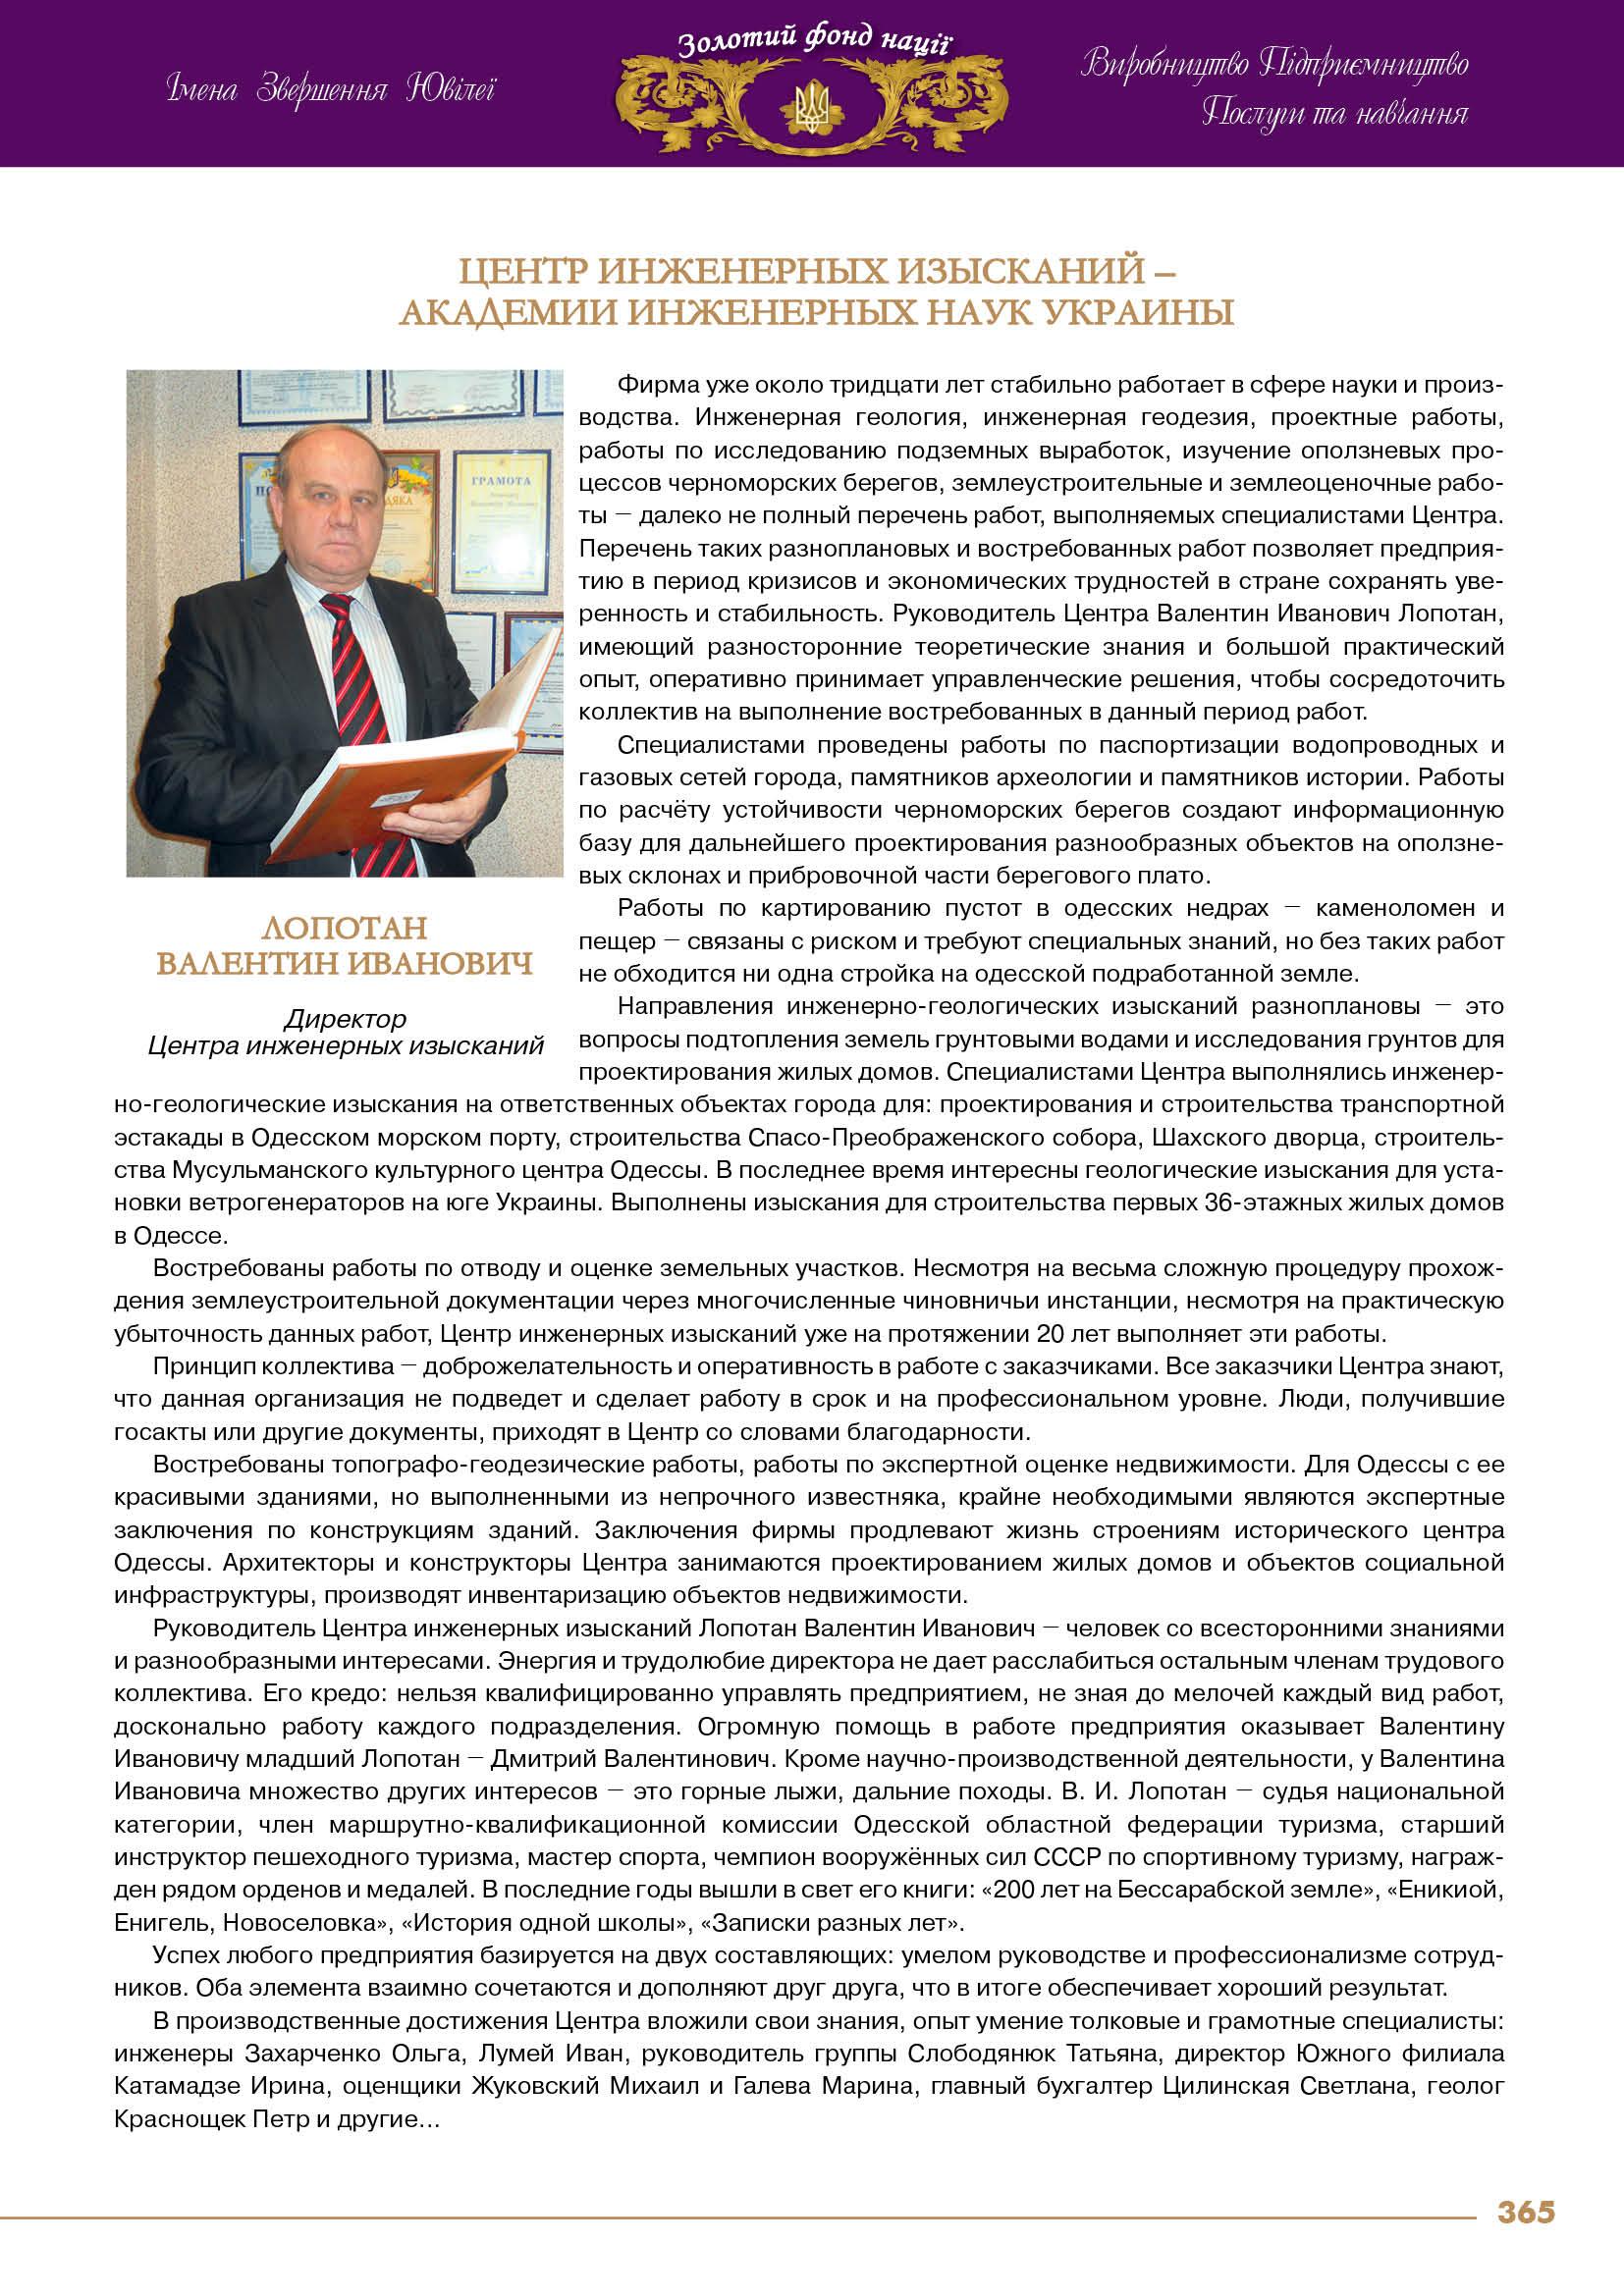 Лопотан Валентин Иванович